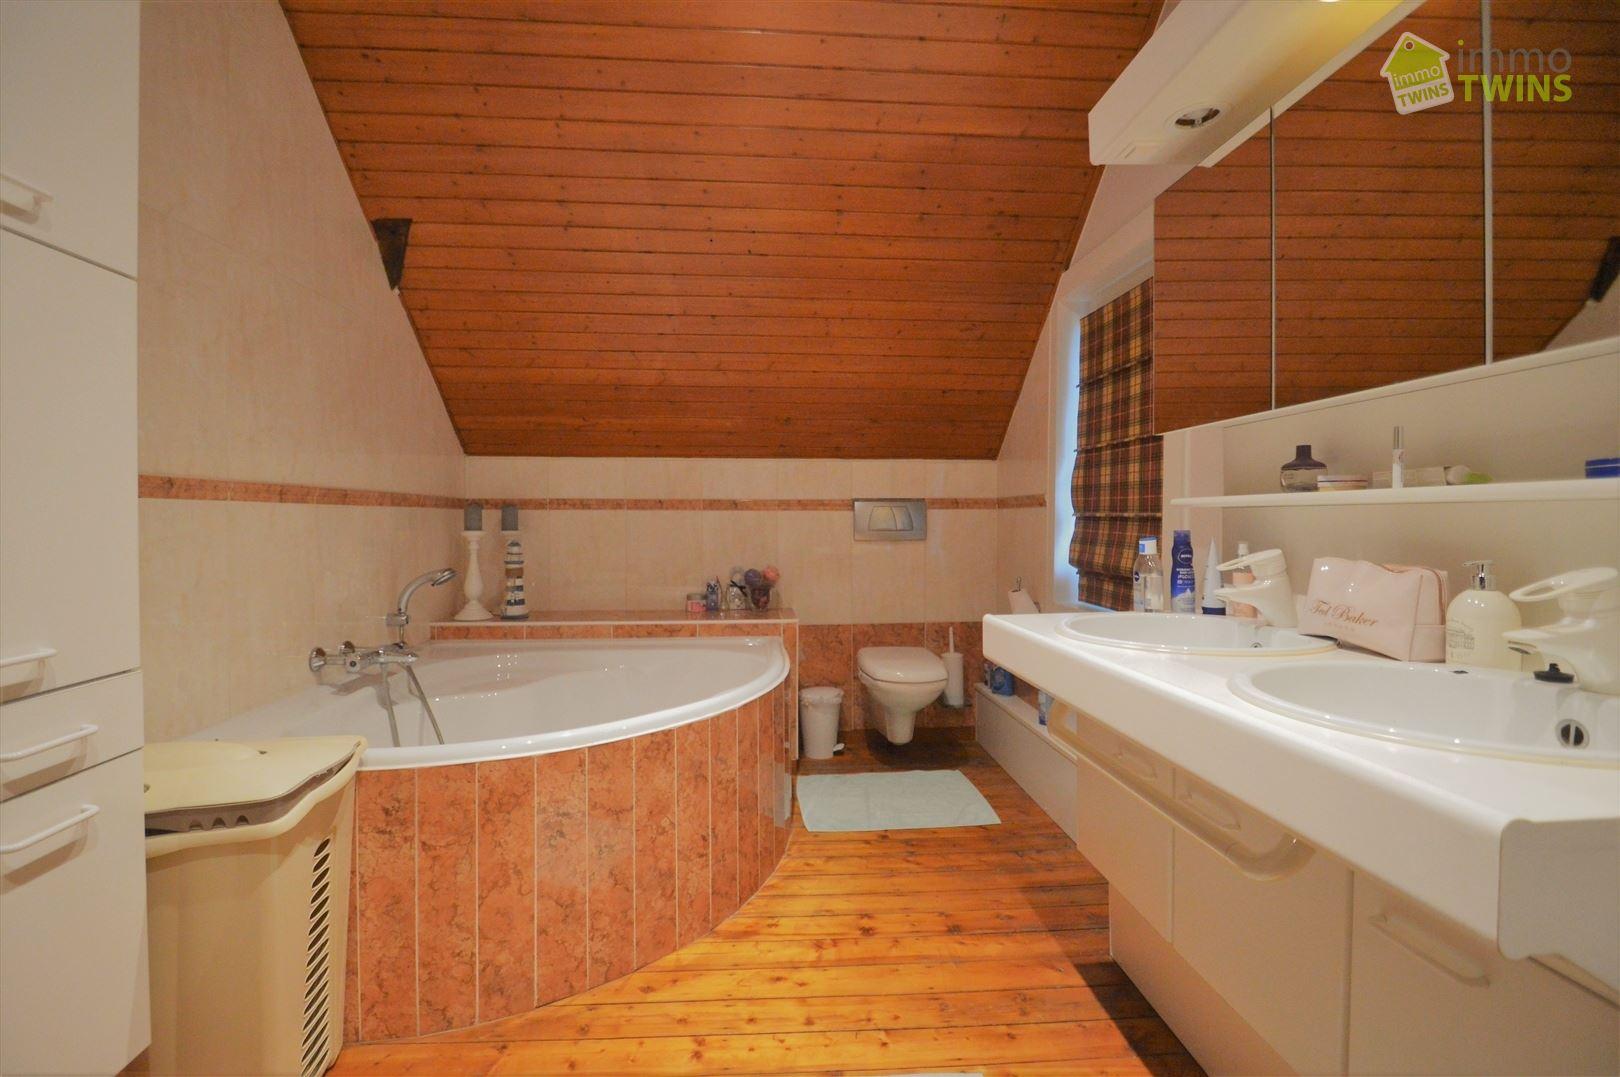 Foto 17 : Duplex/Penthouse te 2890 SINT-AMANDS (België) - Prijs € 449.000